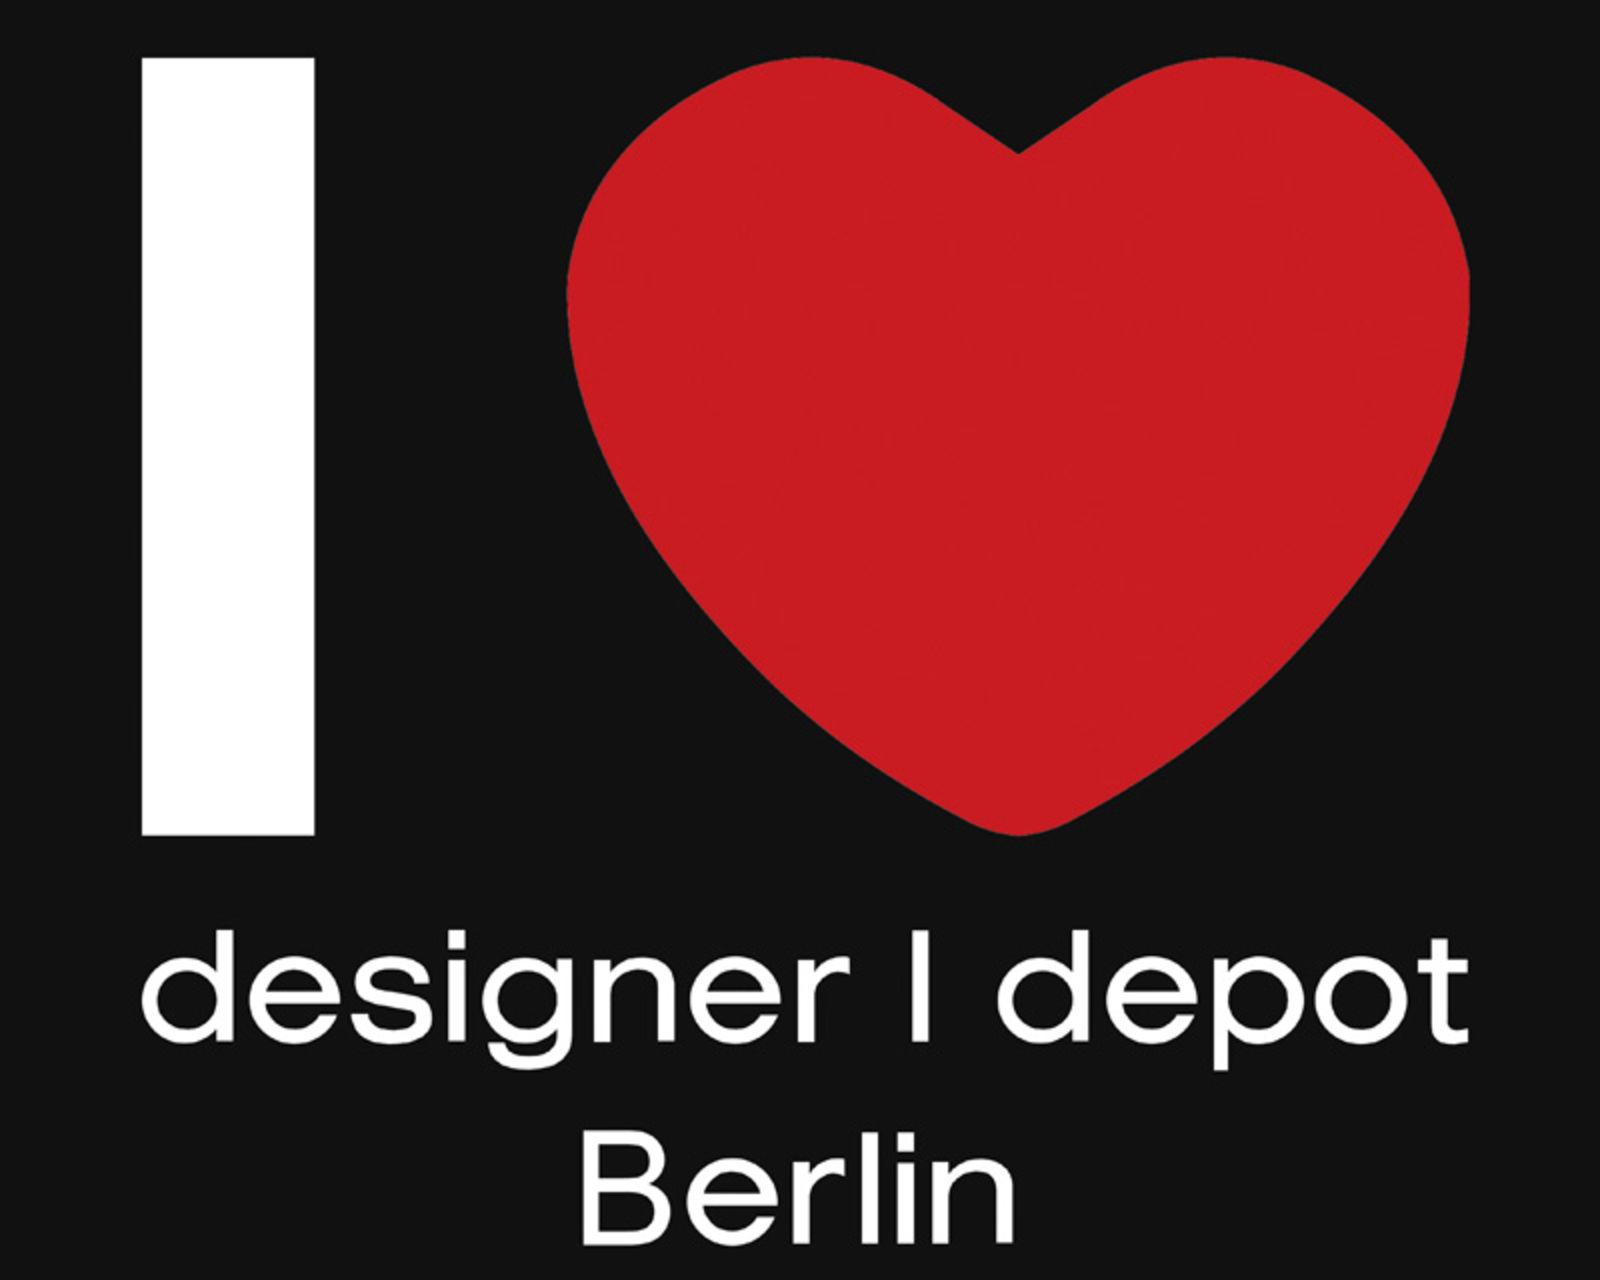 Designer Depot in Berlin (Bild 6)